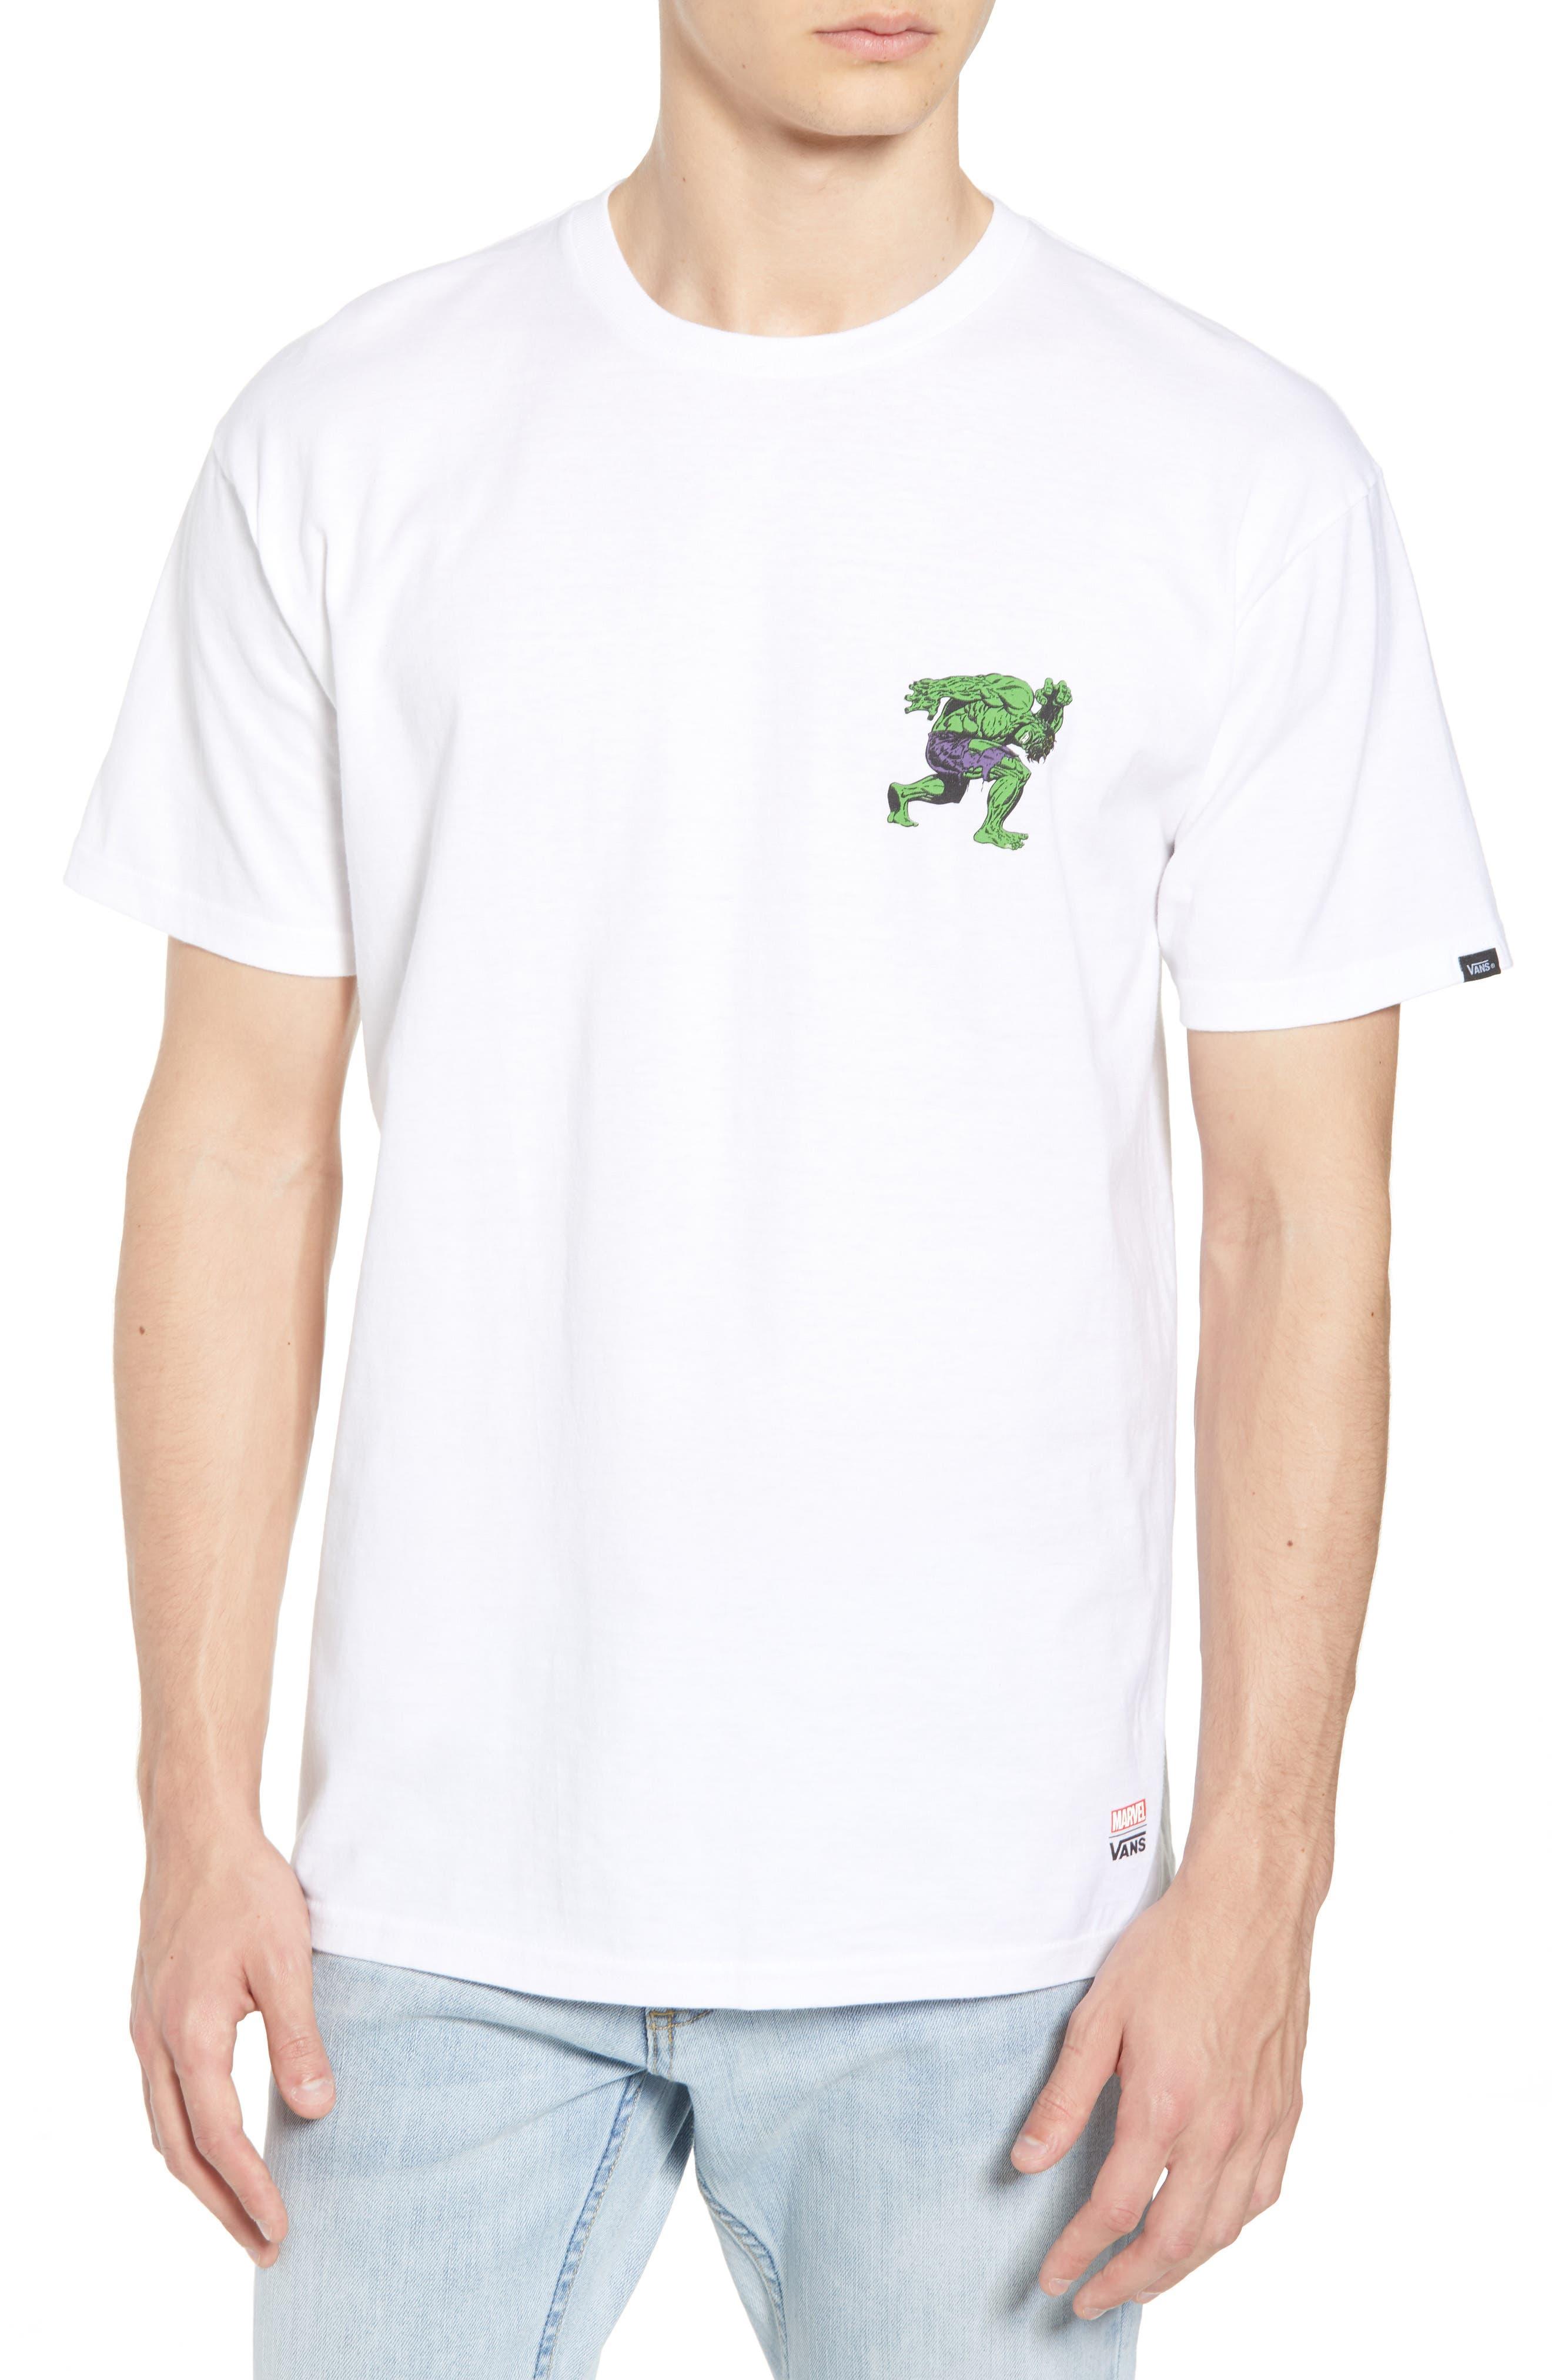 x Marvel<sup>®</sup> Hulk T-Shirt,                         Main,                         color, White